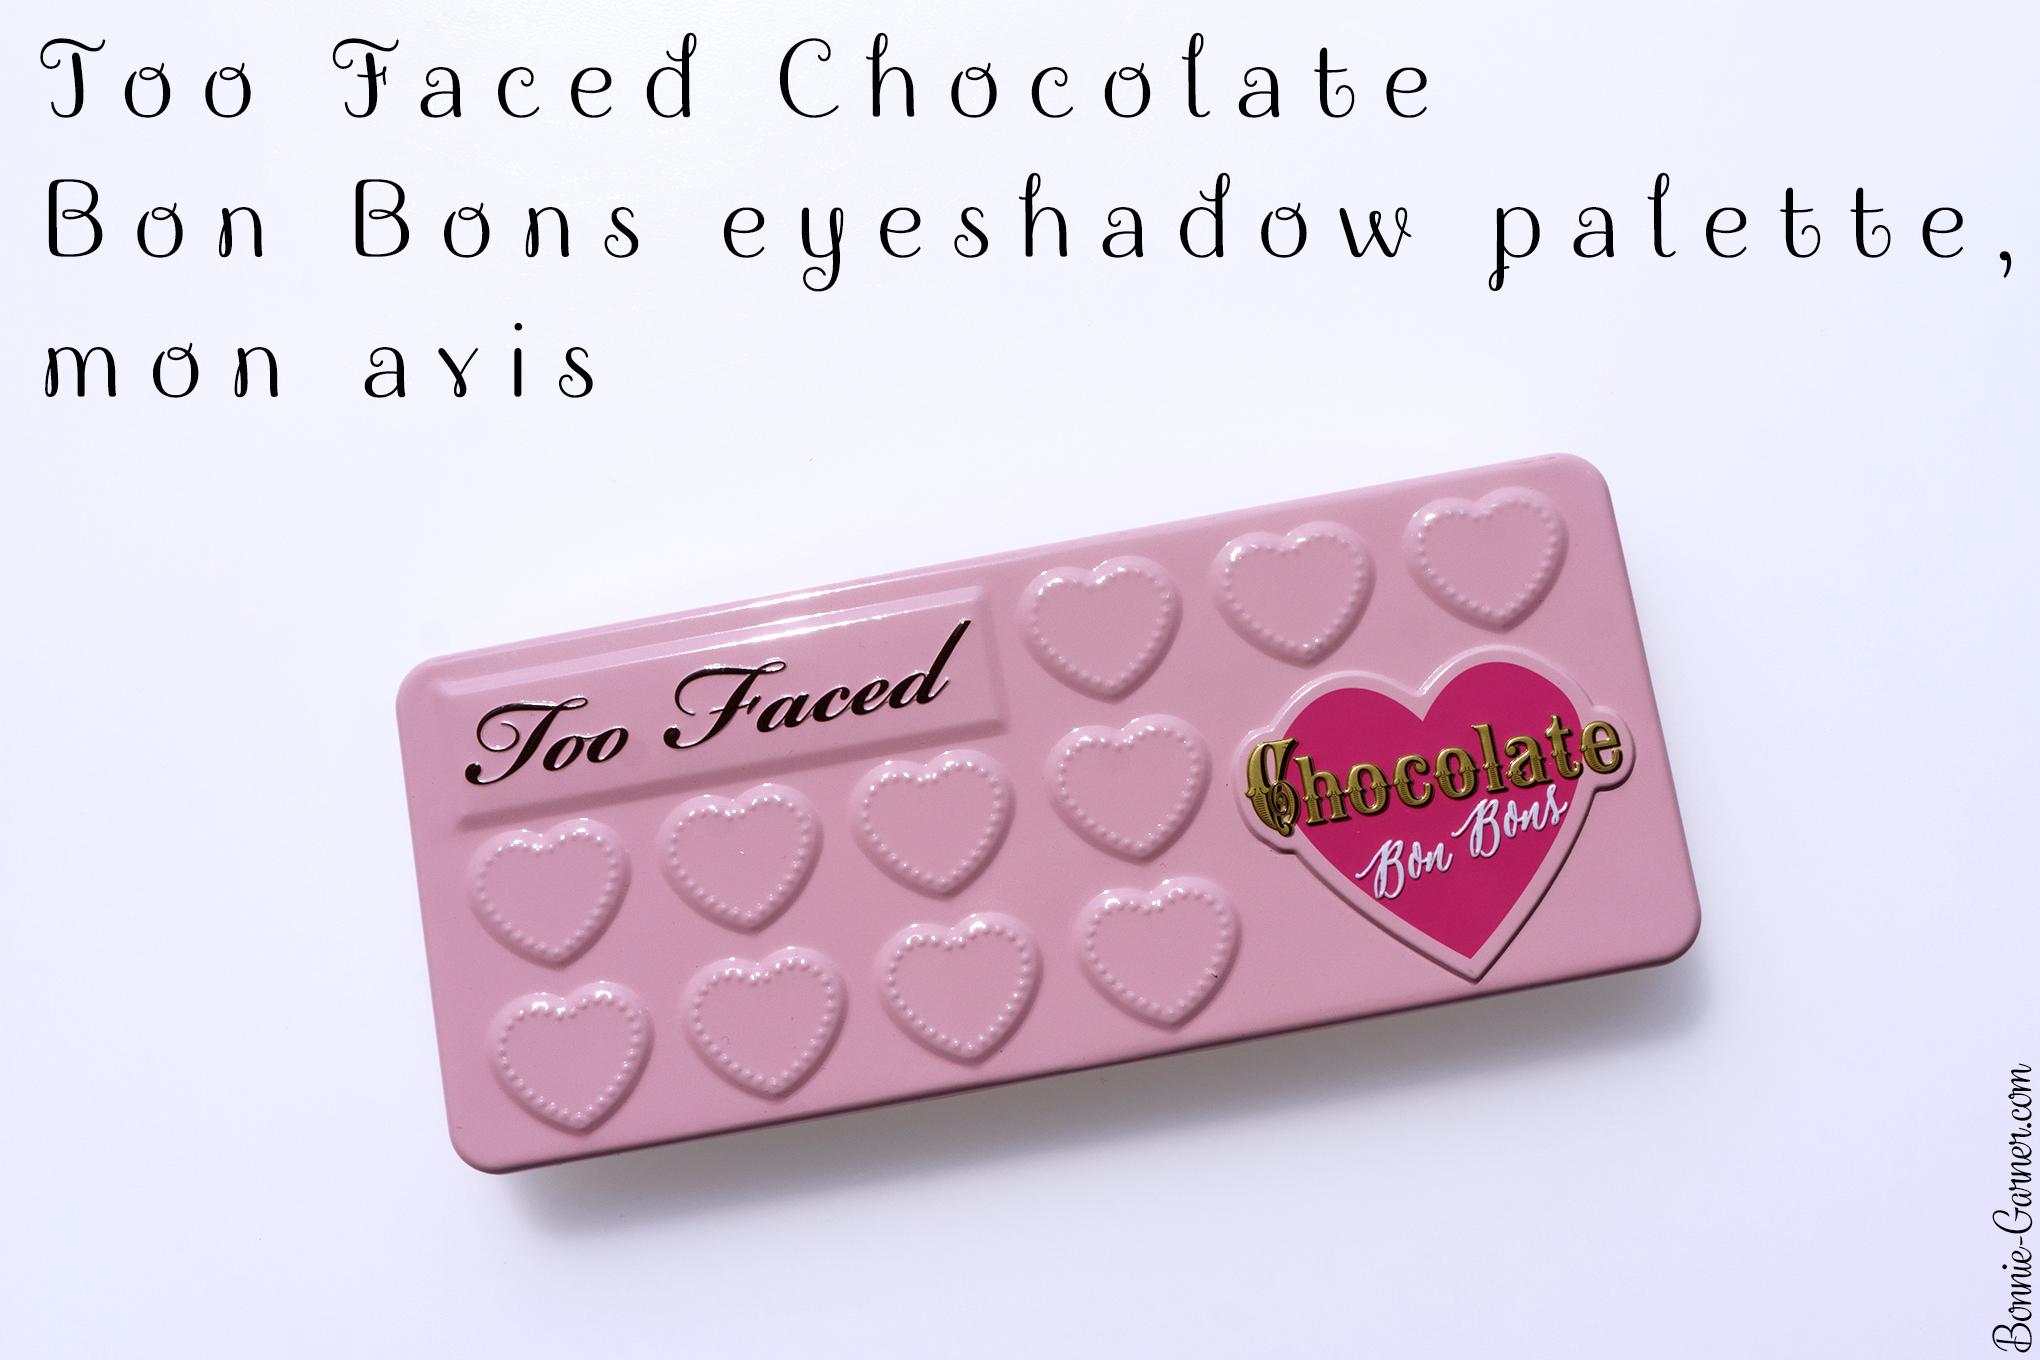 Too Faced Chocolate Bon Bons eyeshadow palette, mon avis